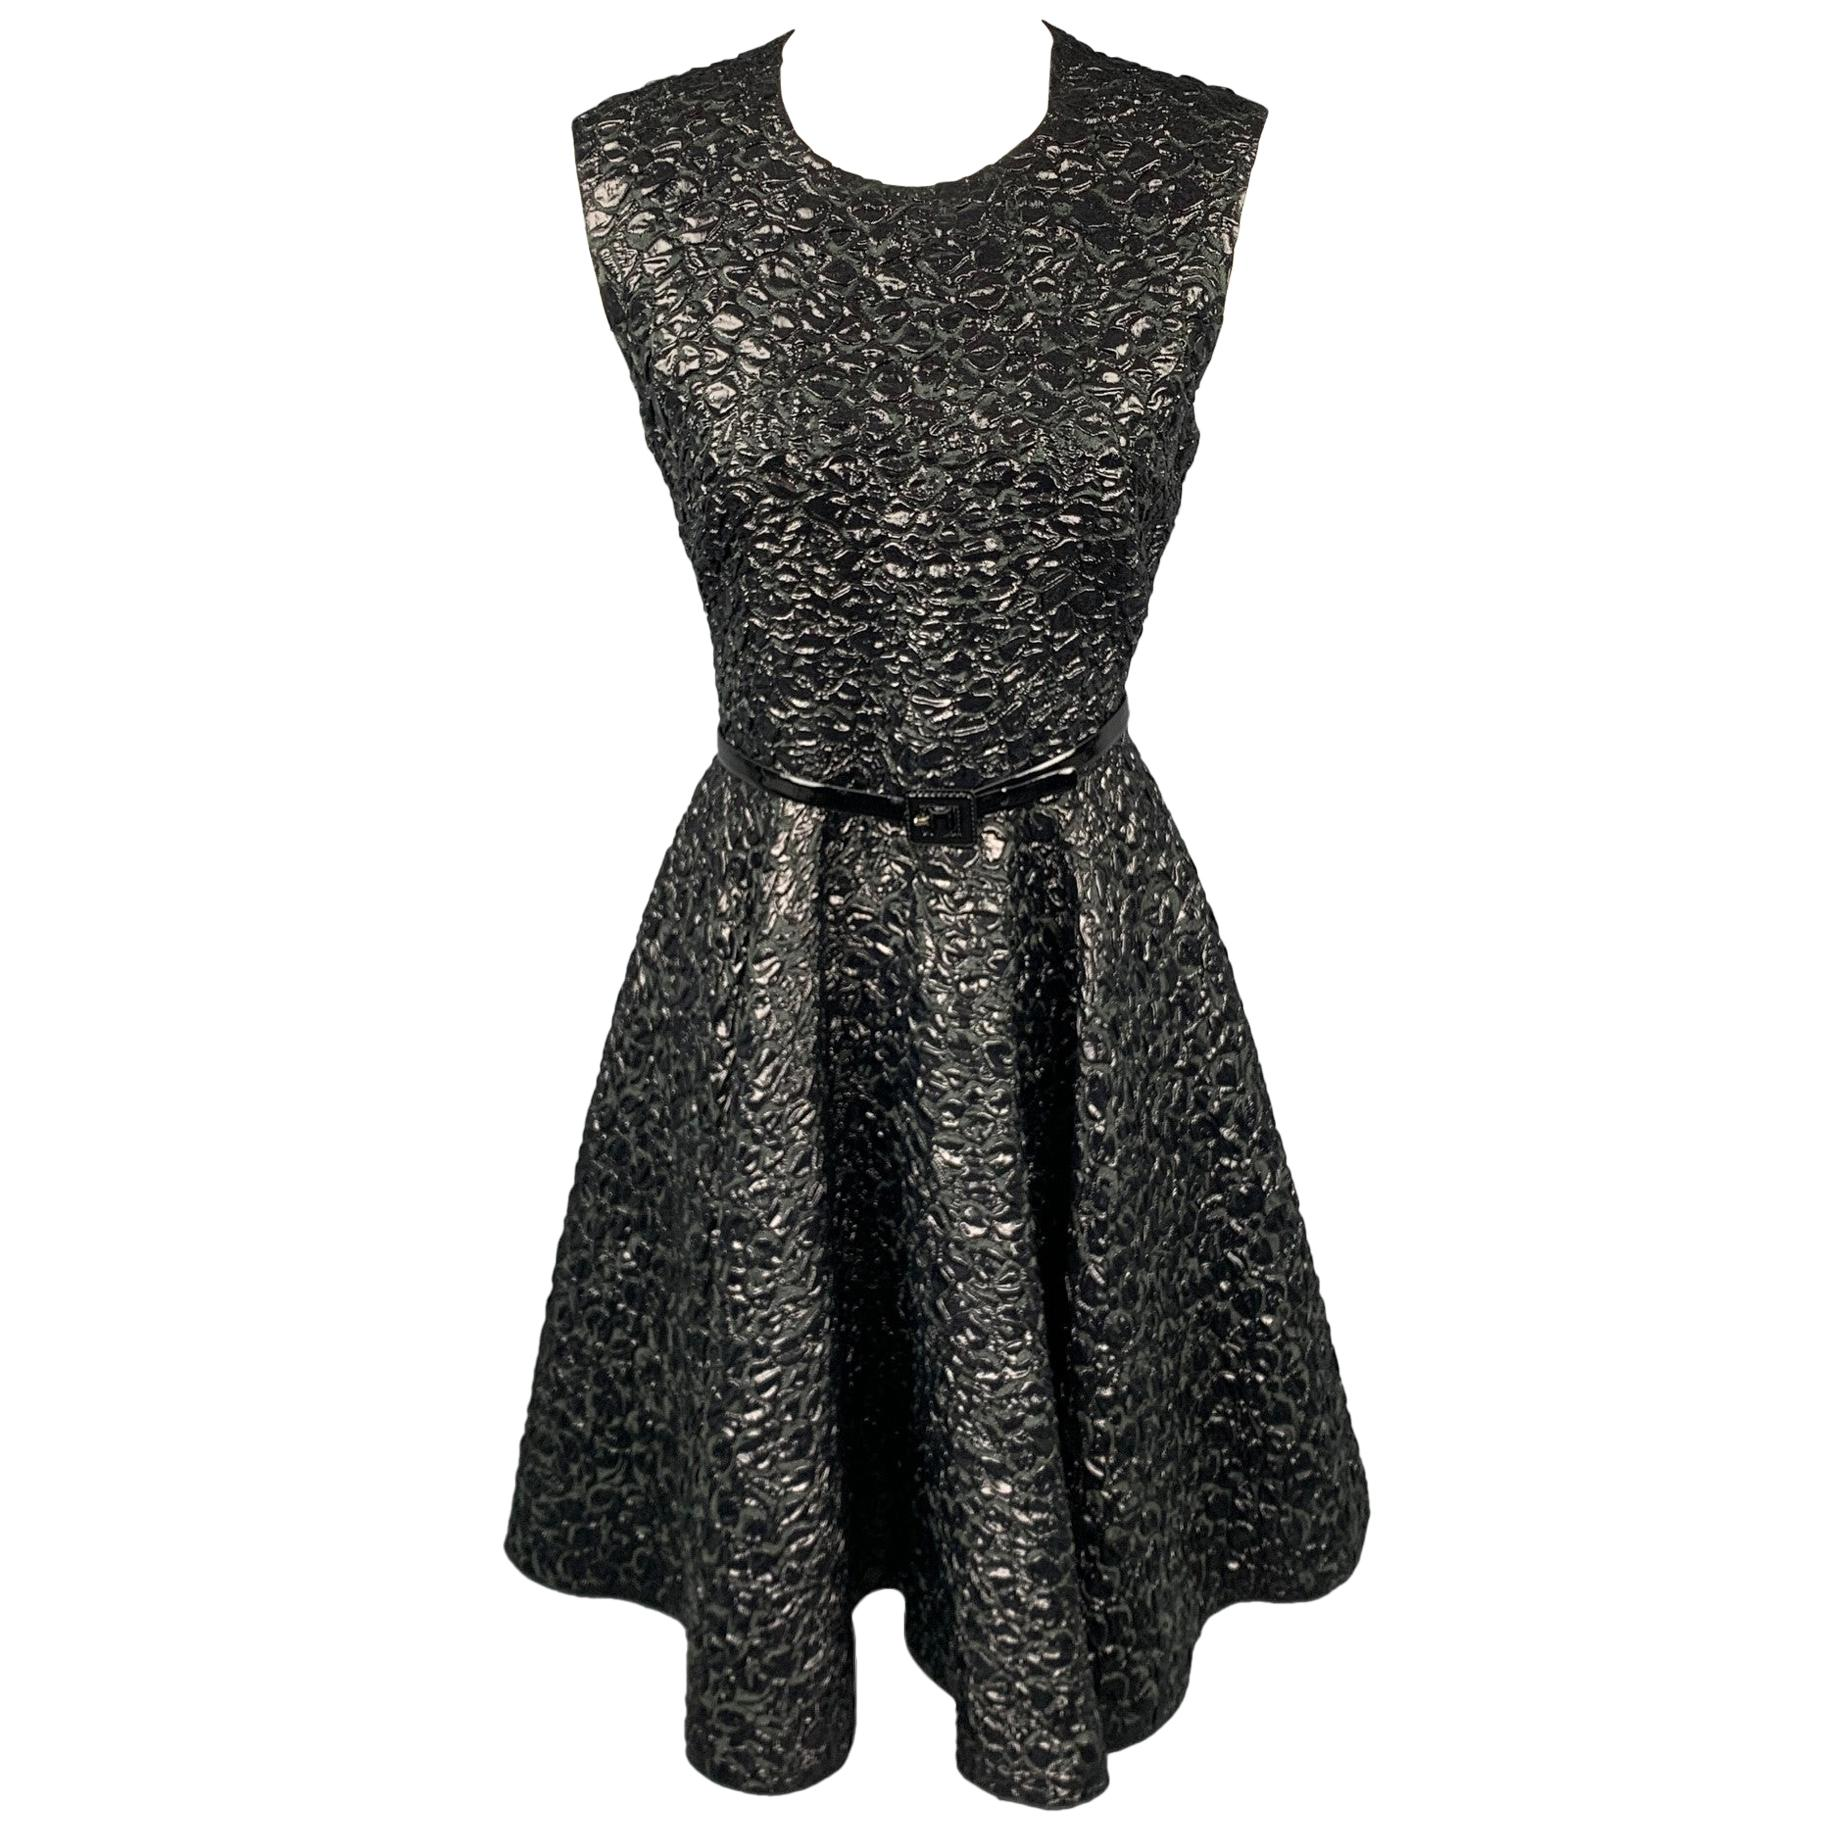 GIAMBATTISTA VALLI Size 6 Black Brocade Polyamide Blend A-Line Dress